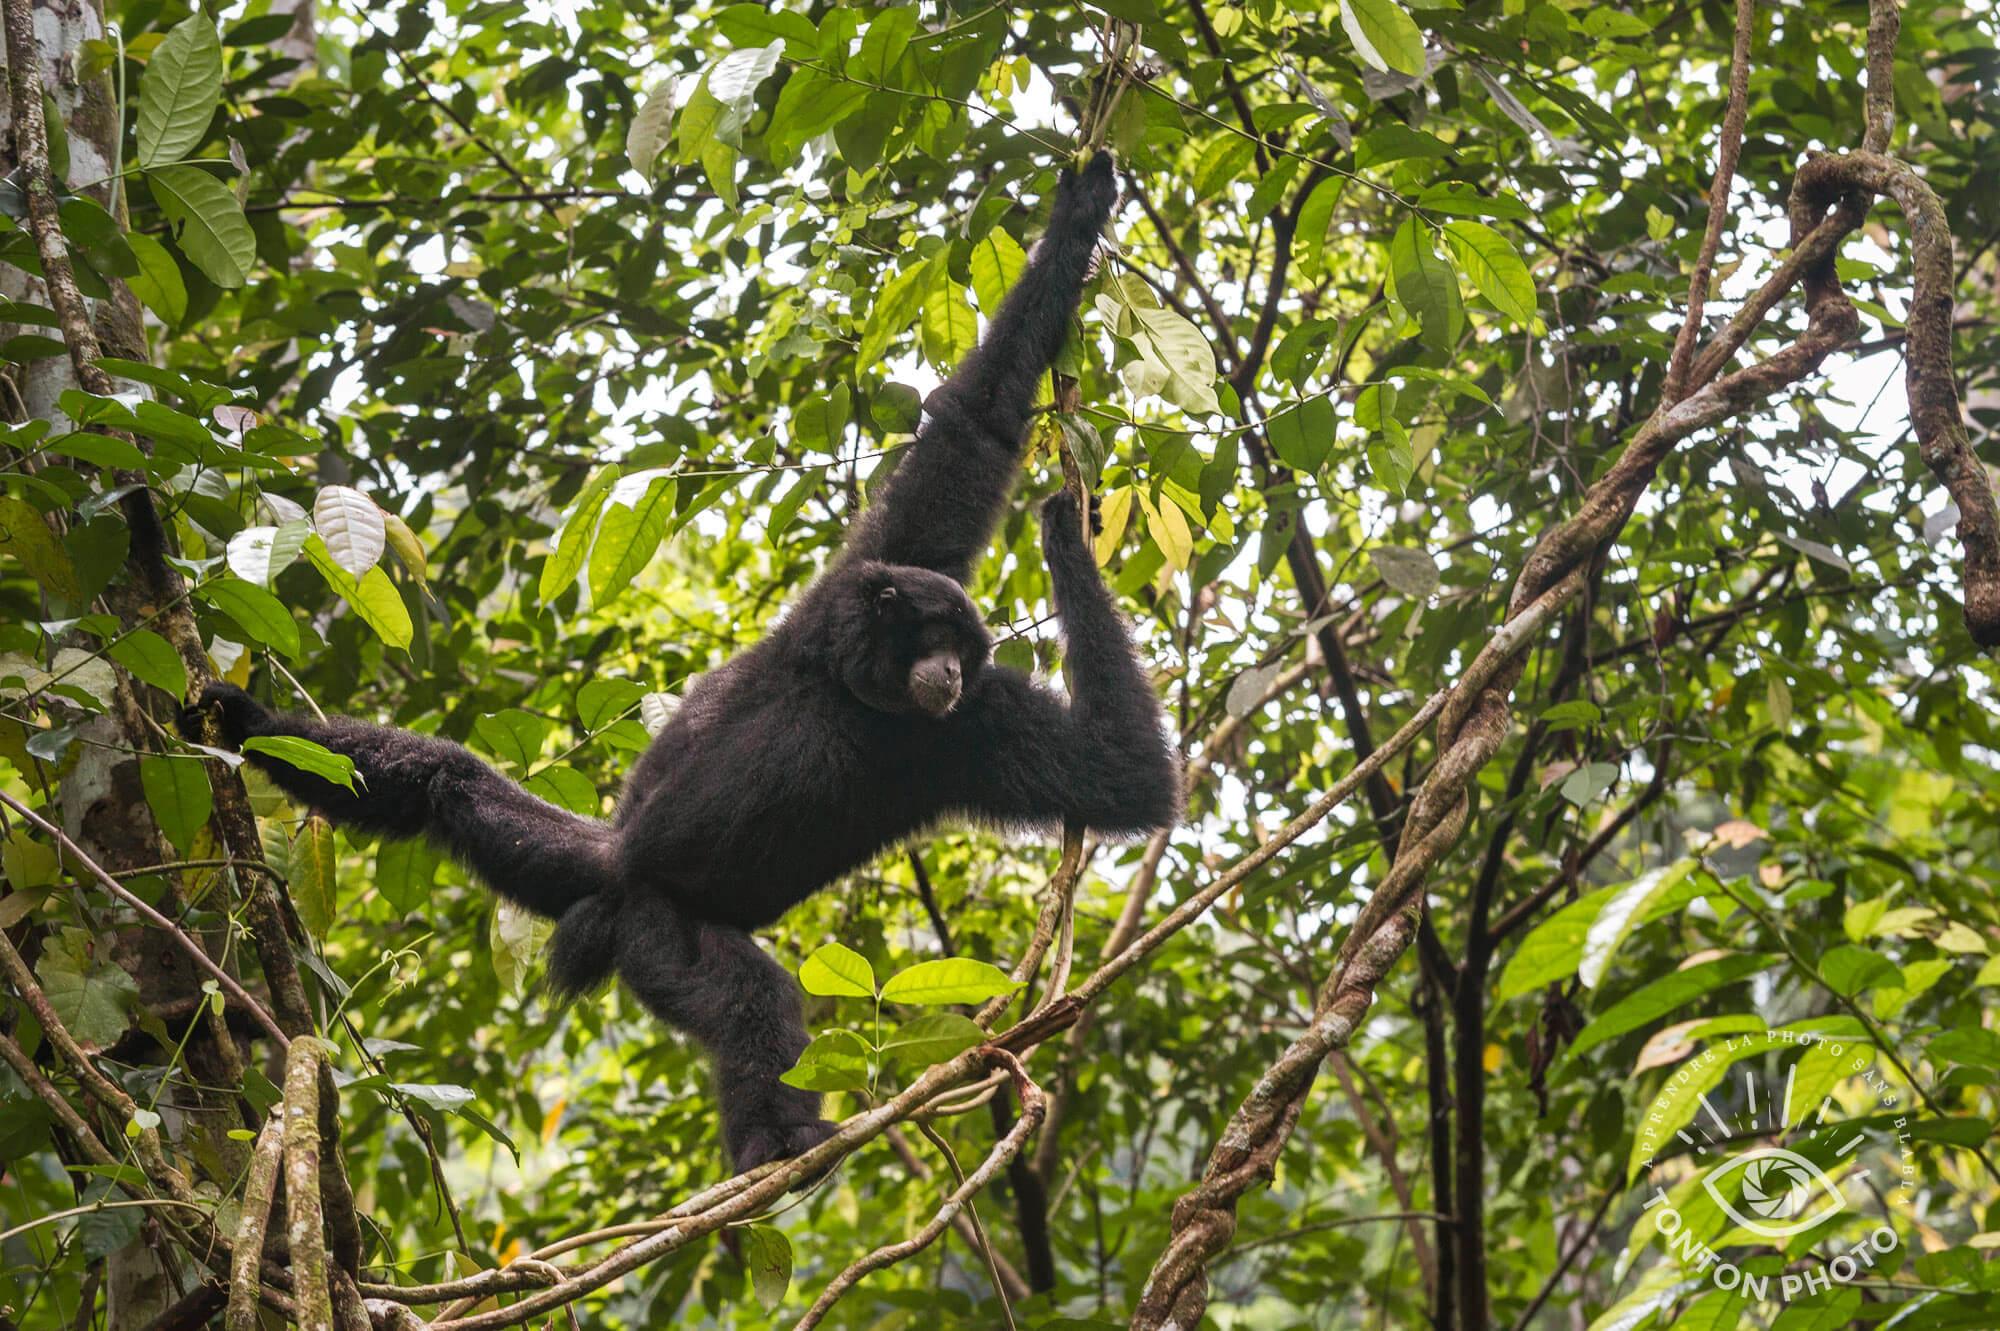 Gibbon noir, Parc National du Gunung Leuser, Sumatra, Indonésie © Clément Racineux / Tonton Photo